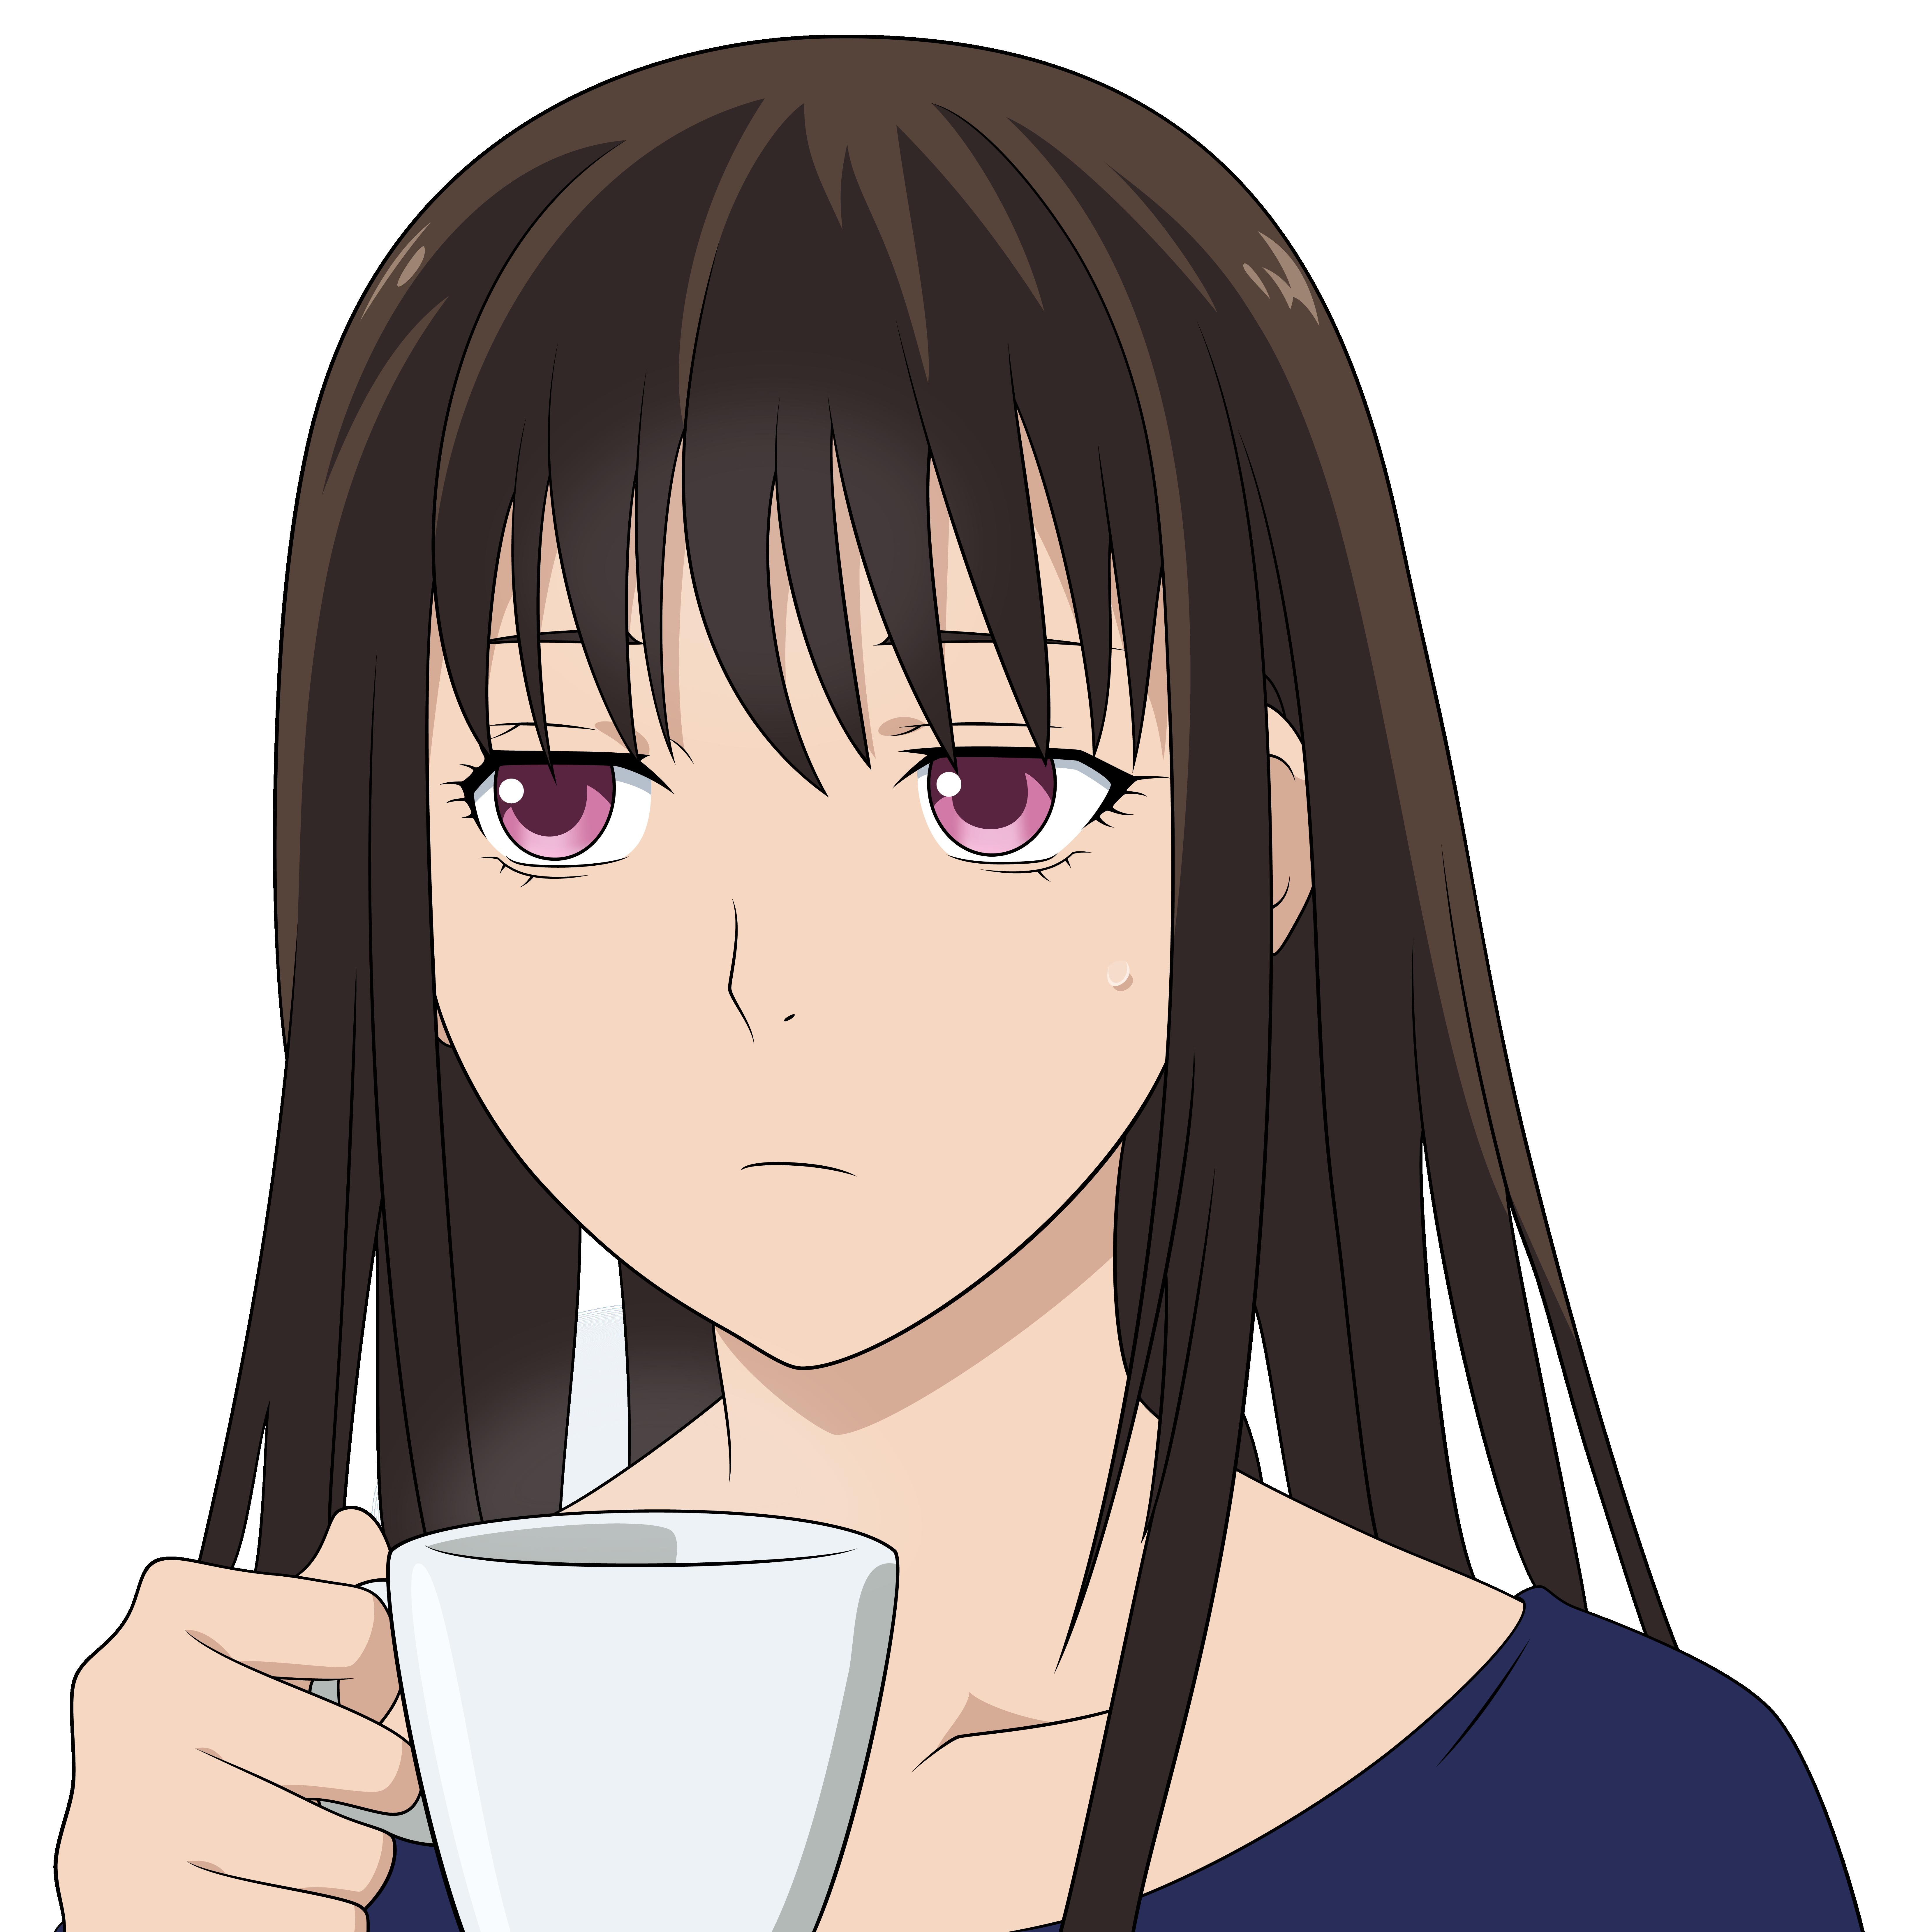 funny anime transparent: (Noitamina) Psycho Pass 2 Key Visual (Autumn 2014) : Anime